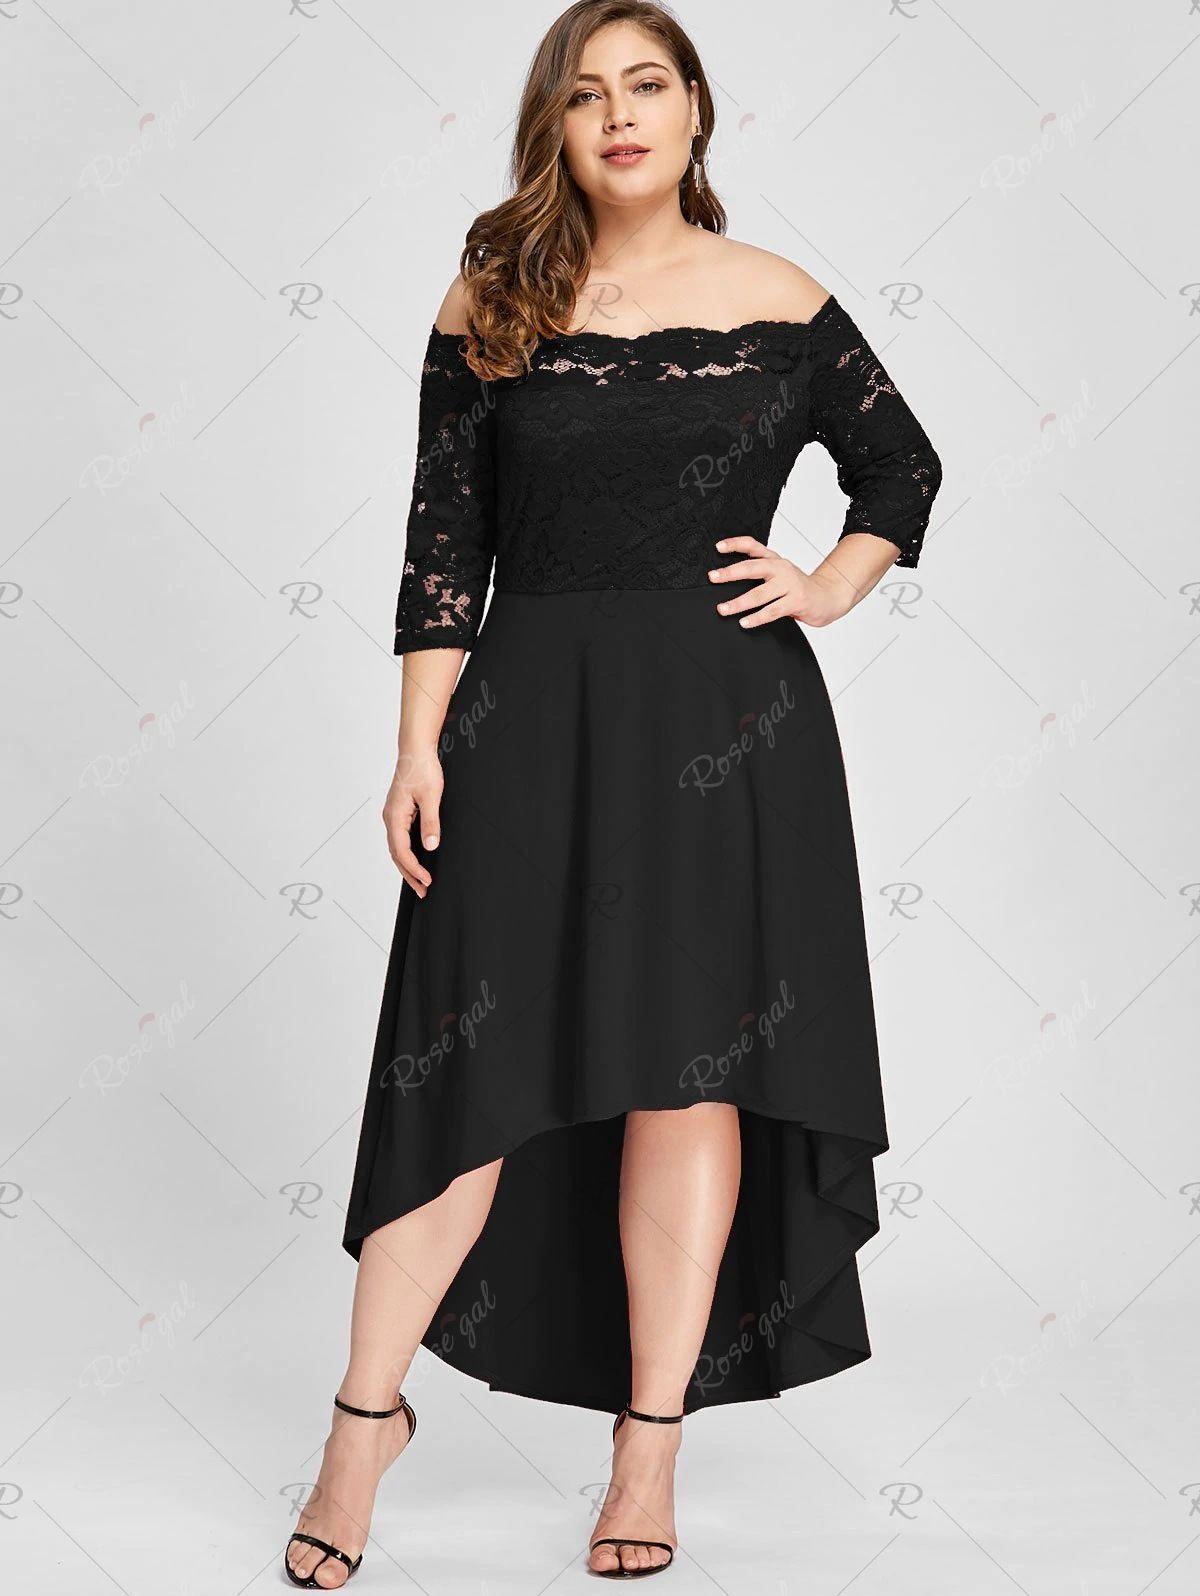 50a418bd07 2019 Long Sleeves Prom Lace A Line Homecoming Dresses Tulle Applique Short  Prom Cocktail Party Dresses Plus Size Vestidos De Festa Best Prom Dresses  2015 ...